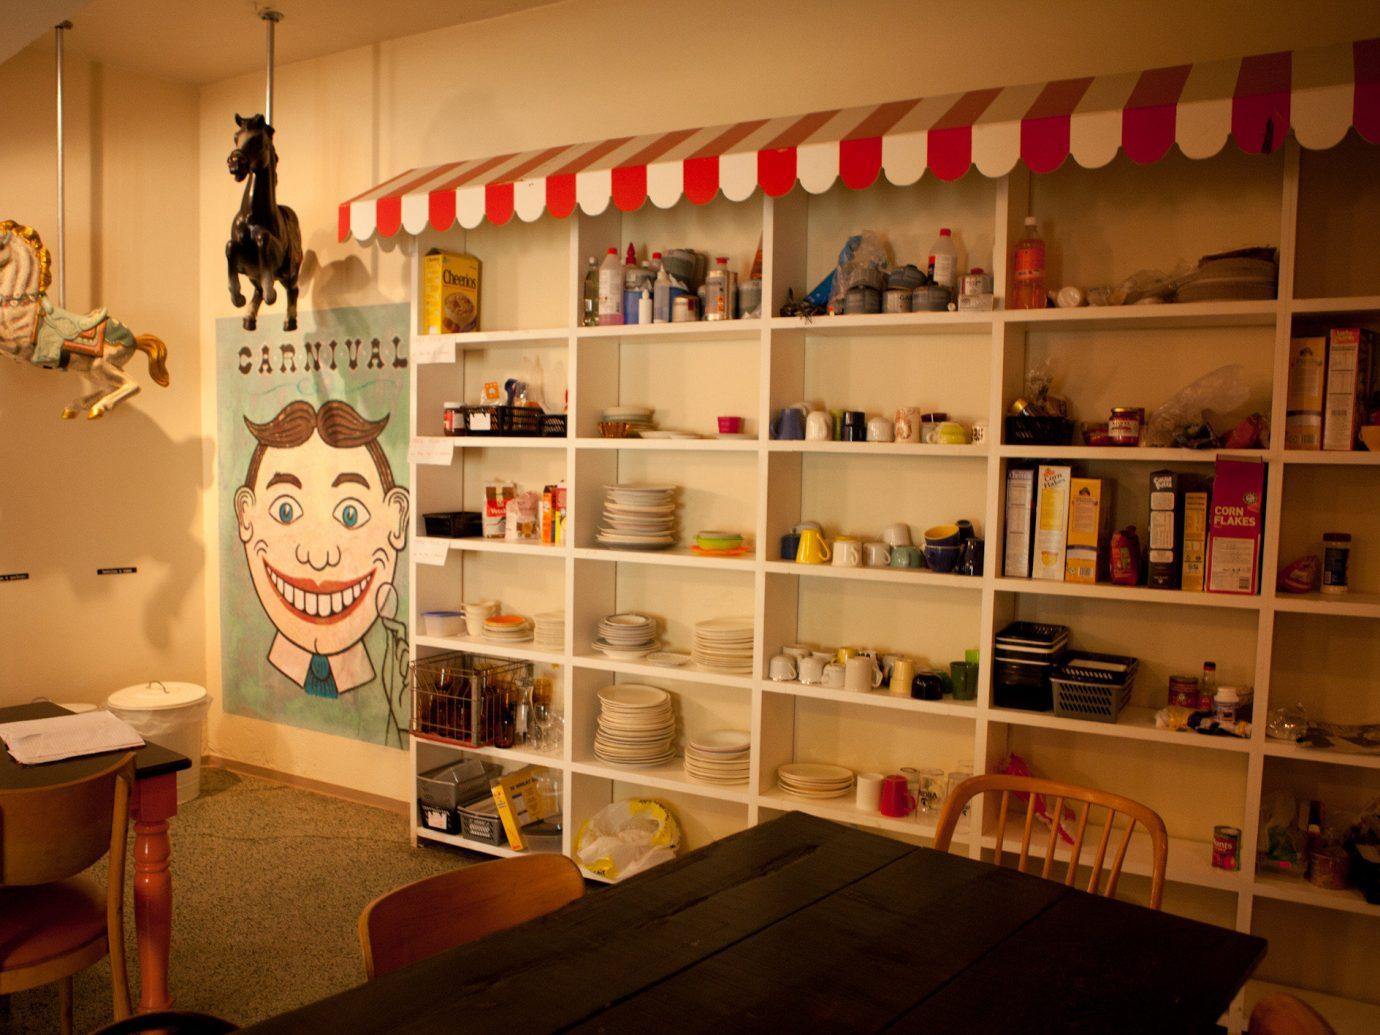 Iceland Trip Ideas indoor wall shelf room ceiling art interior design Design several